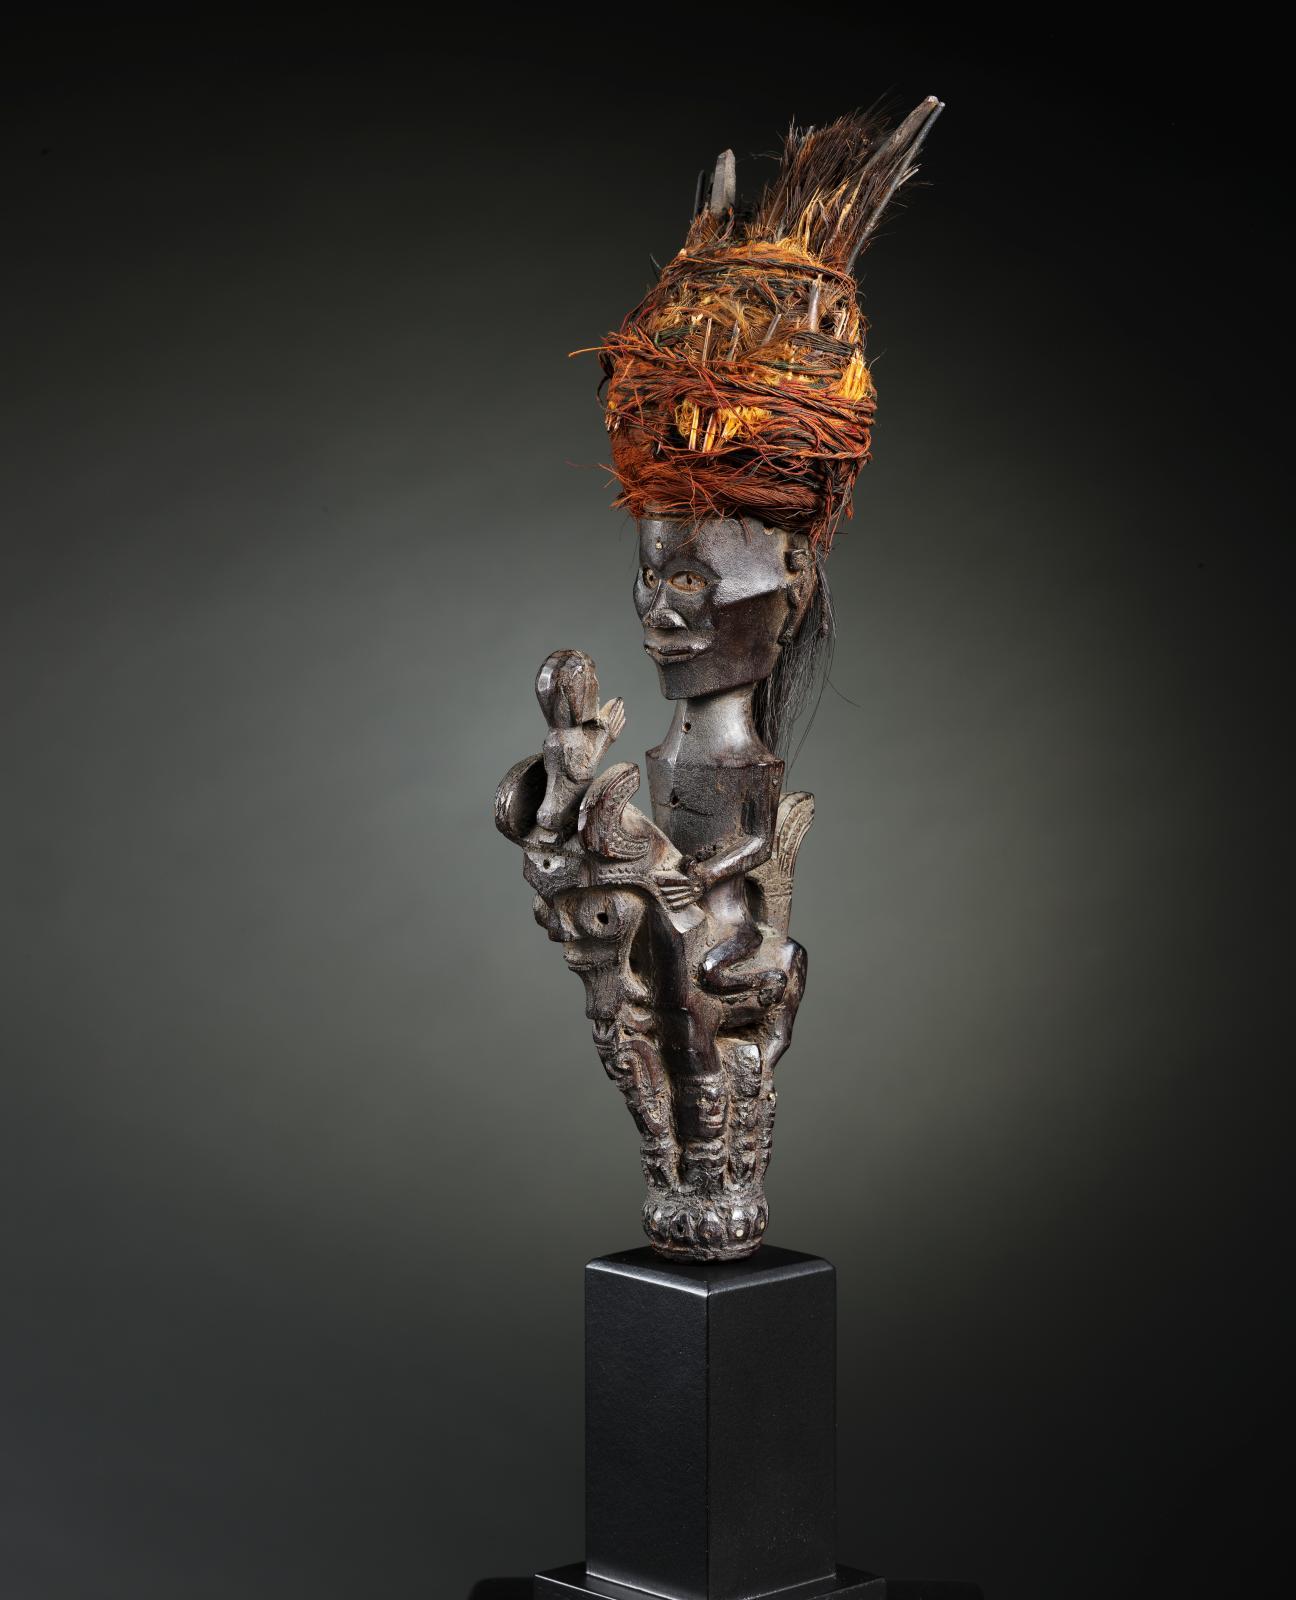 Karo Batak, Sumatra, 18th-19th century, headpiece of a shaman's staff (tungkot malehat), wood, cotton, hair, feathers, h. 32.8 cm.Thomas Murray galle